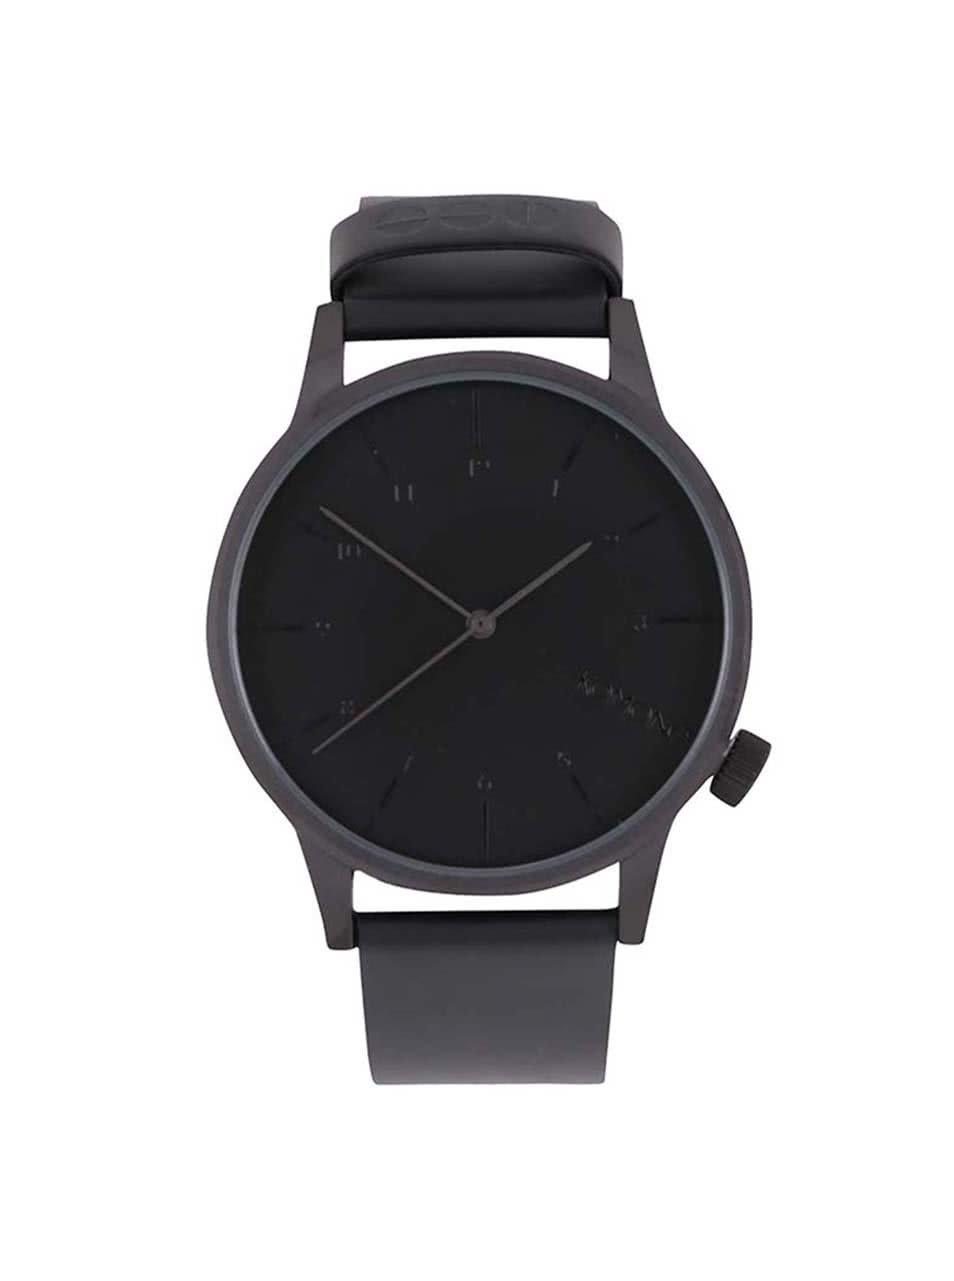 Černé pánské hodinky s koženým páskem Komono Winston Regal